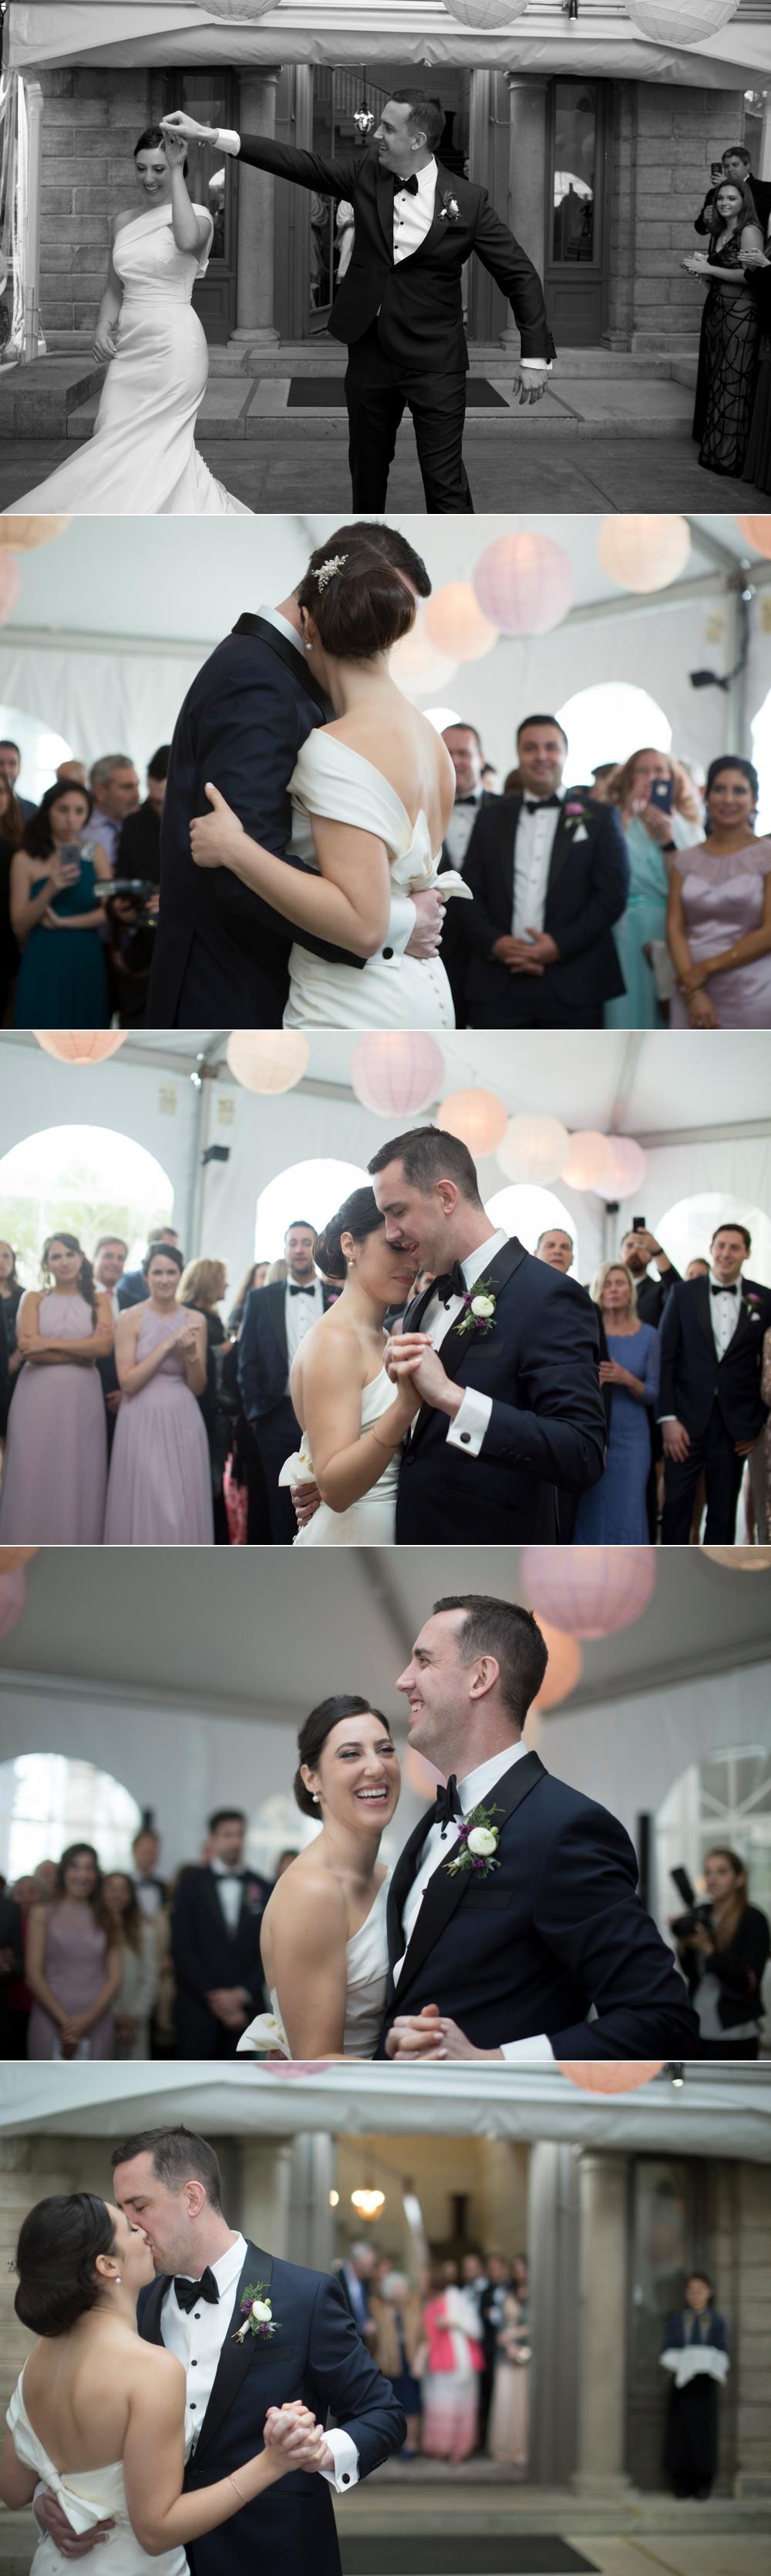 EoilaMansion_Wedding_Leah&Tom_0038.jpg